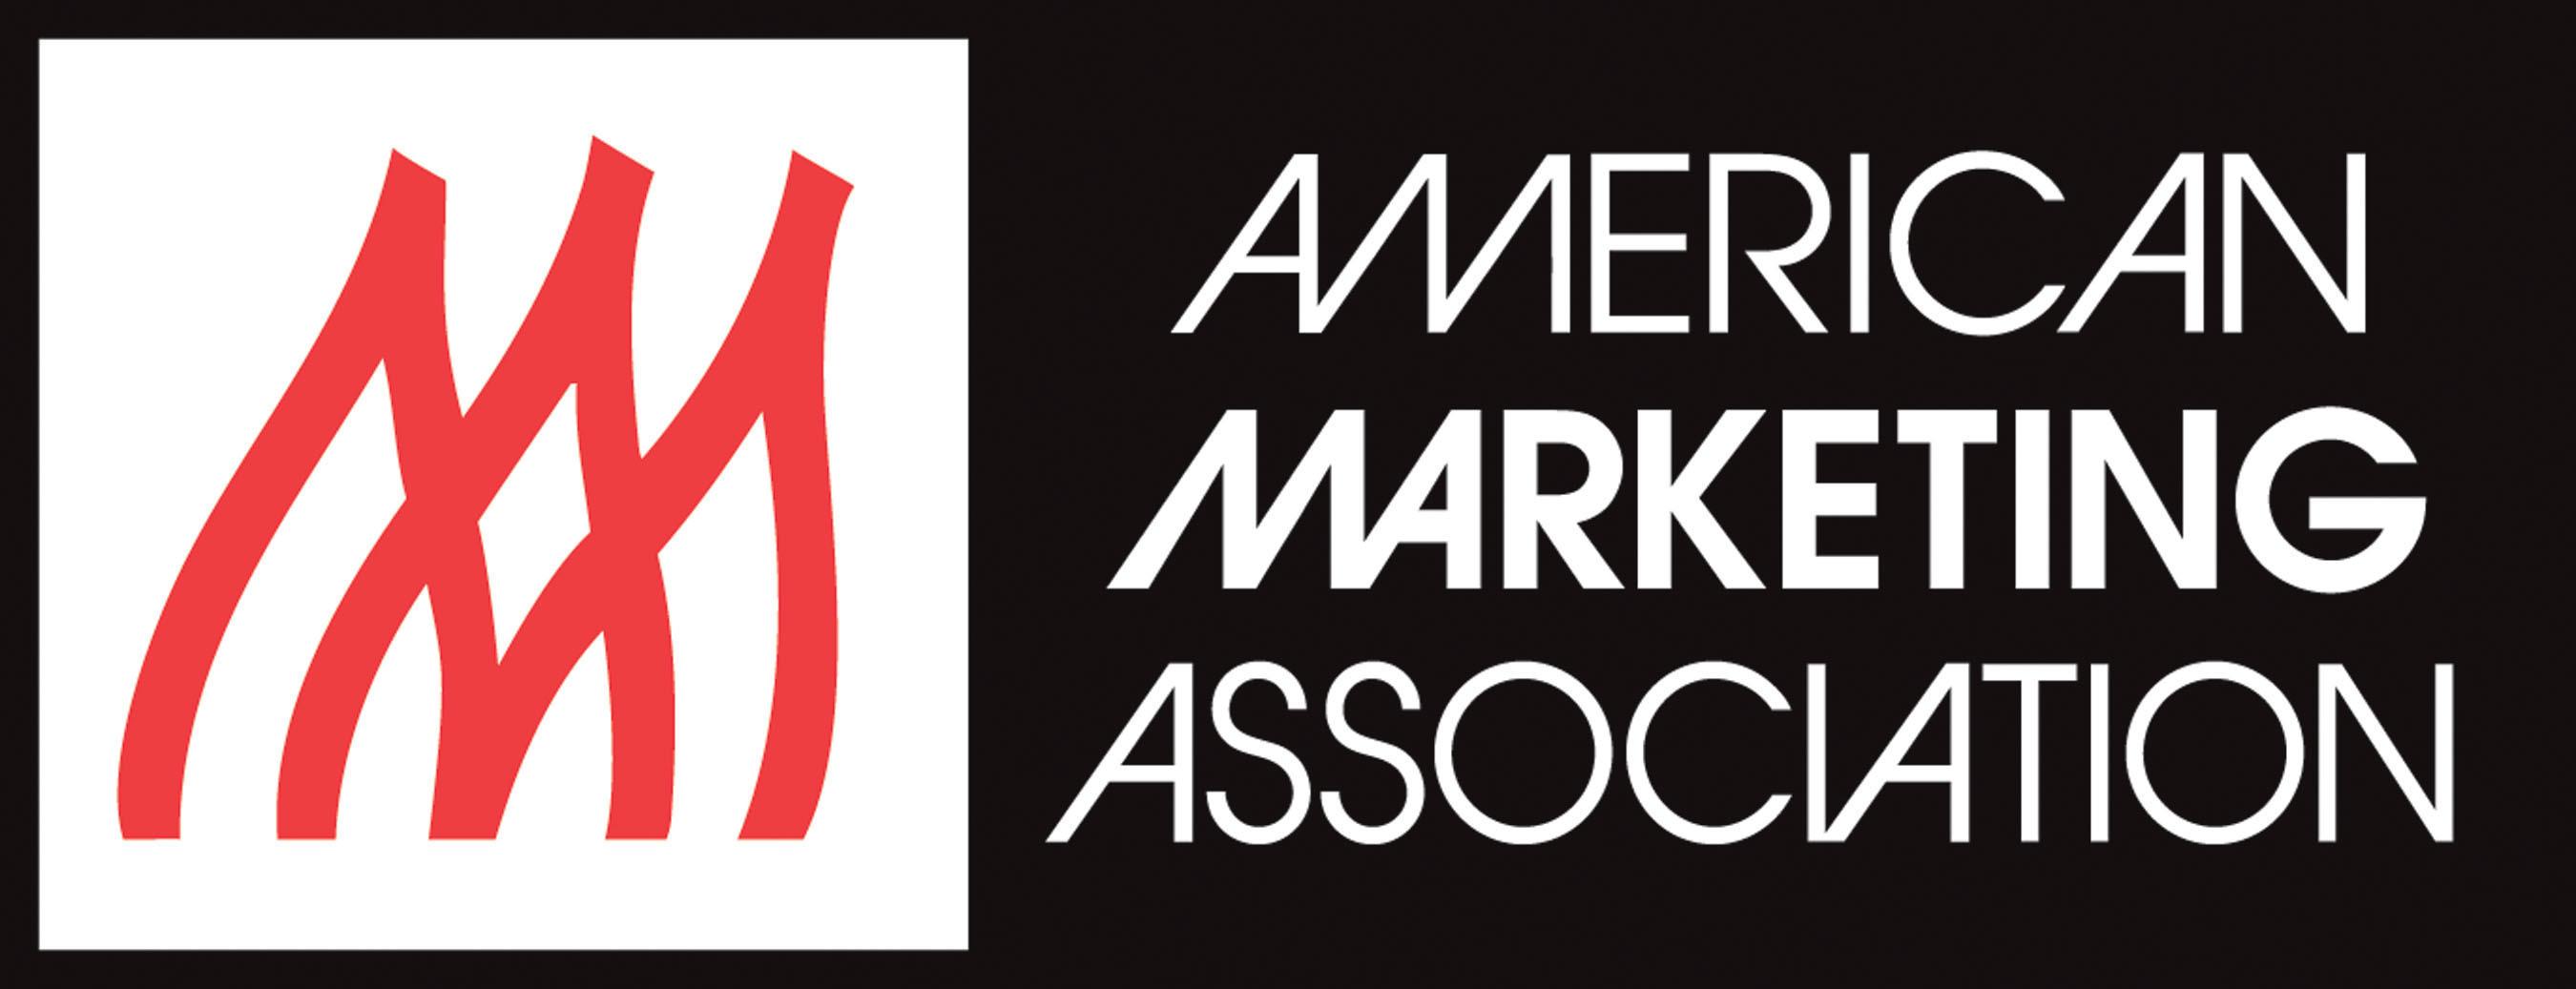 American Marketing Association.